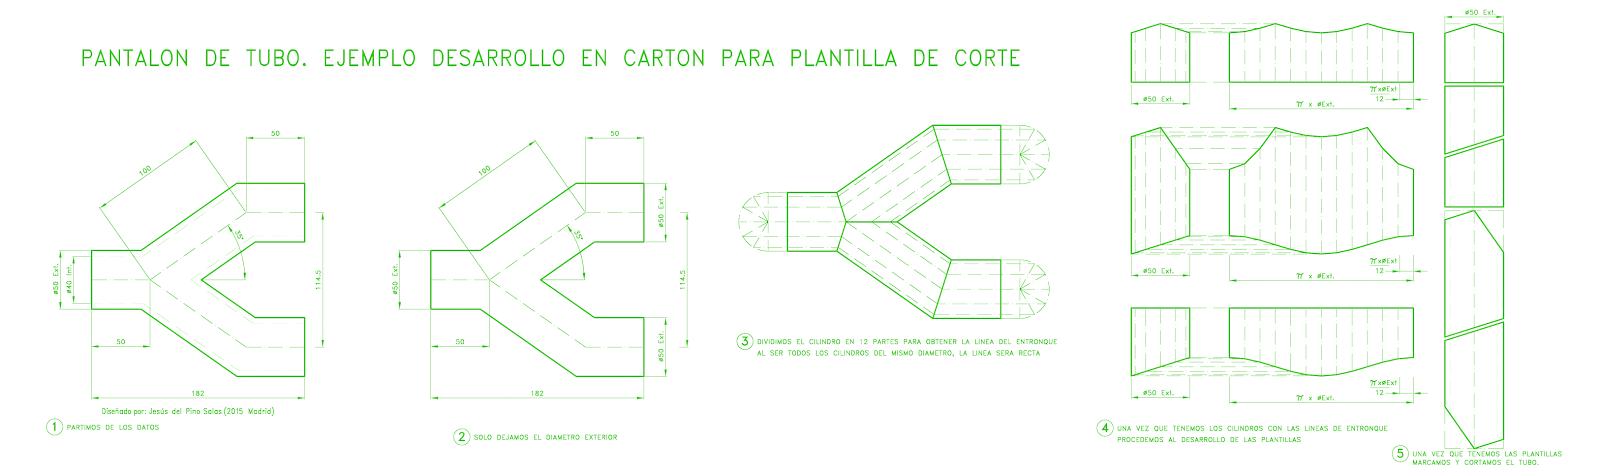 desarrollo y trazado de pantalón para fabricar con lamina o tubo ...